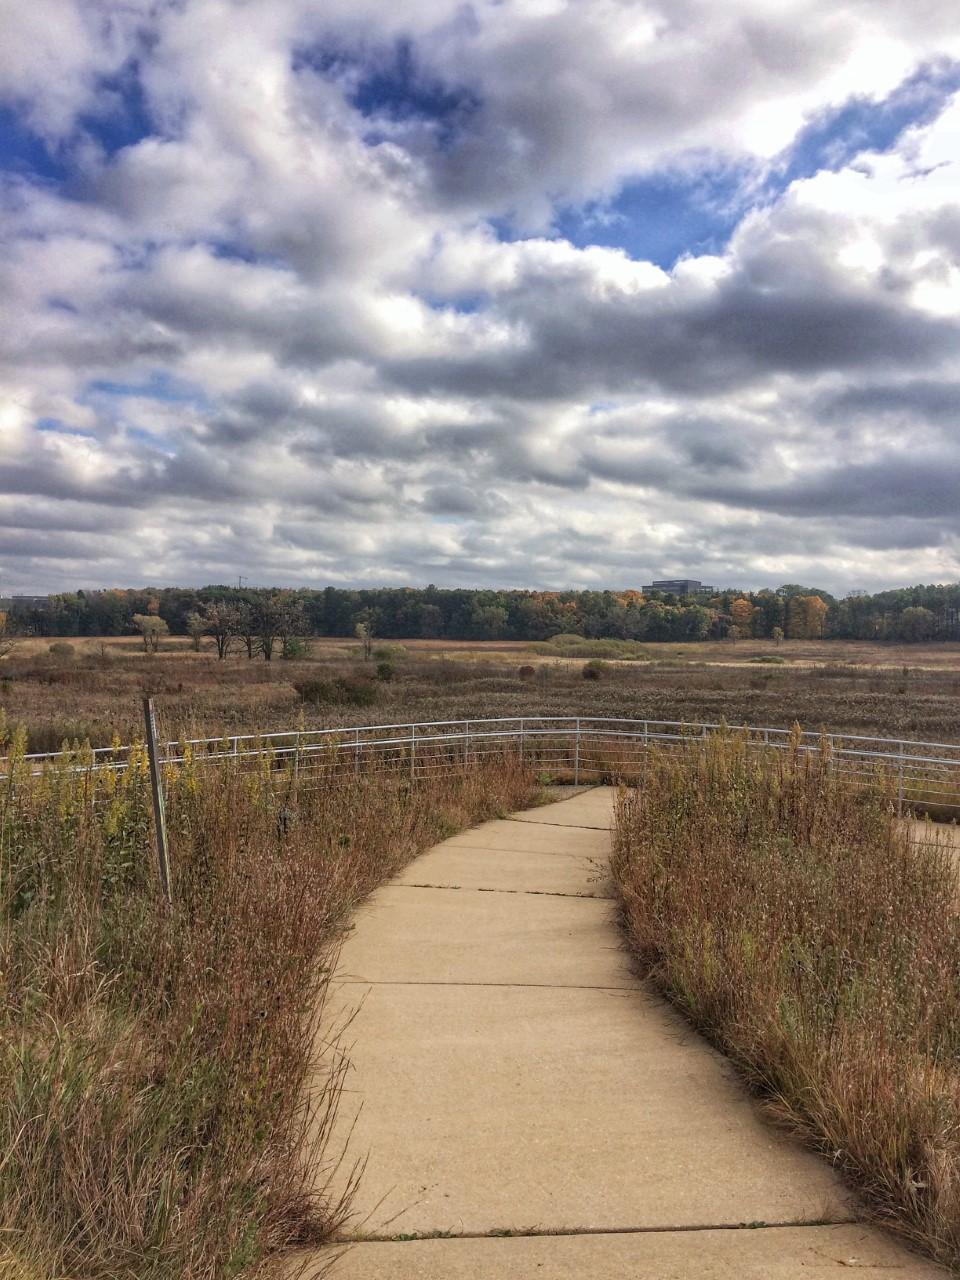 University of Wisconsin- Madison Arboretum